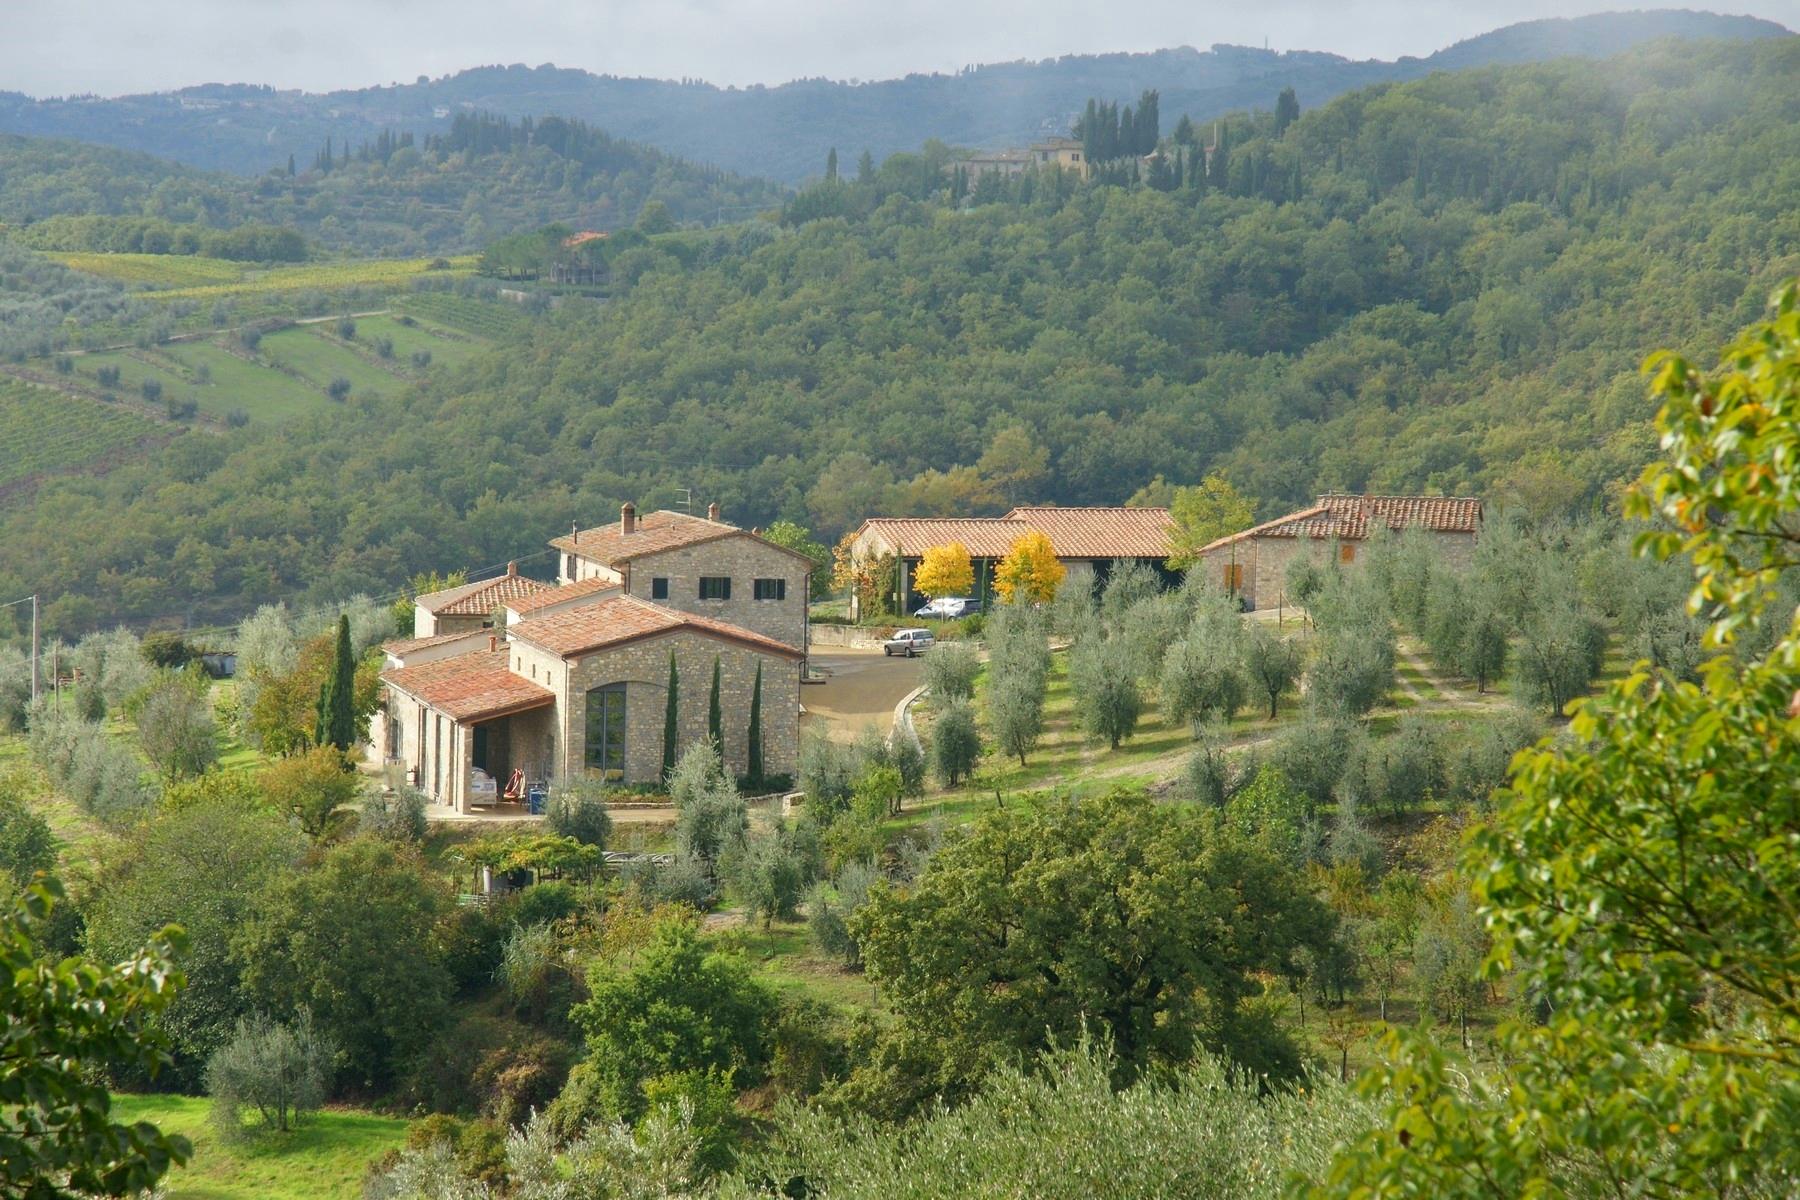 Rustico in Vendita a Radda In Chianti: 5 locali, 1380 mq - Foto 2